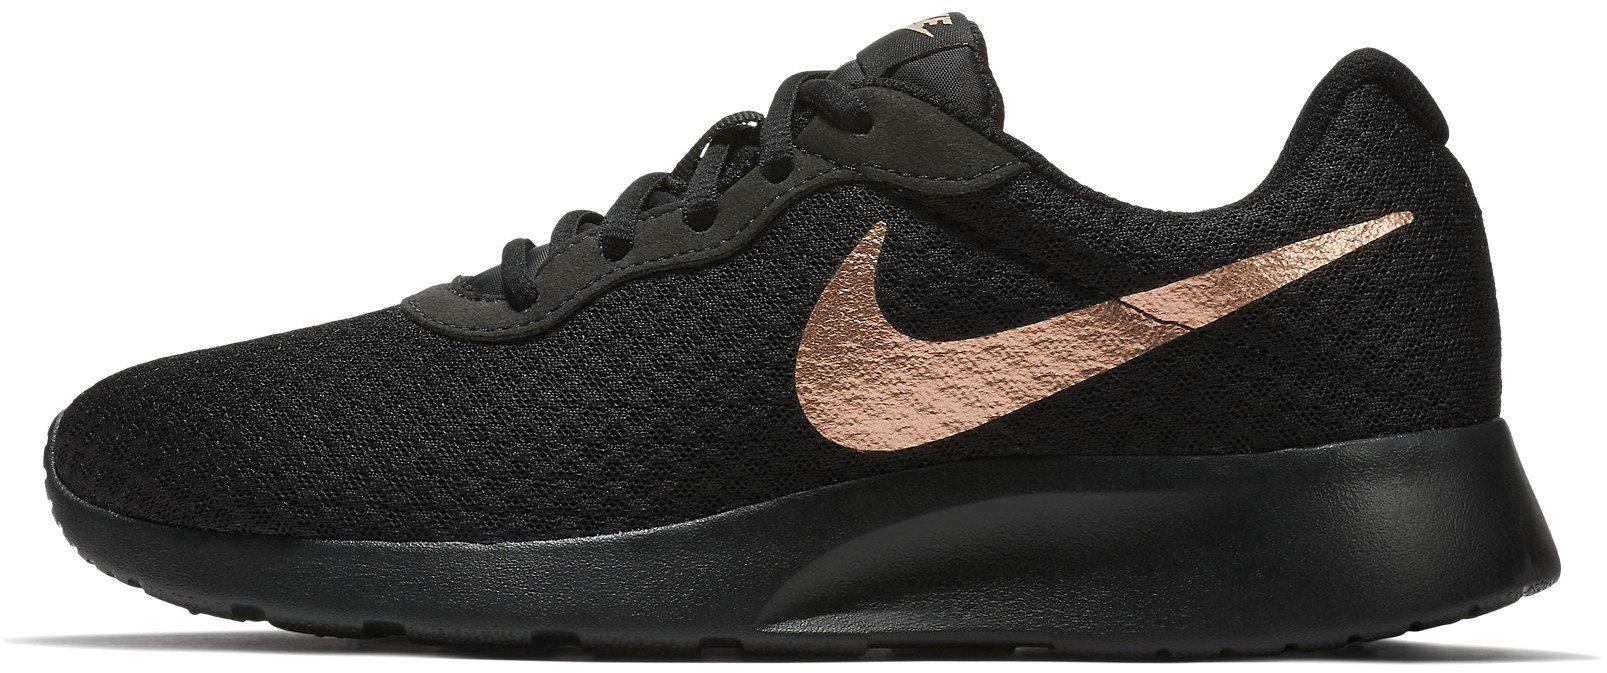 f9d90e8fc Dámské boty Nike TANJUN - Top4Fitness.cz